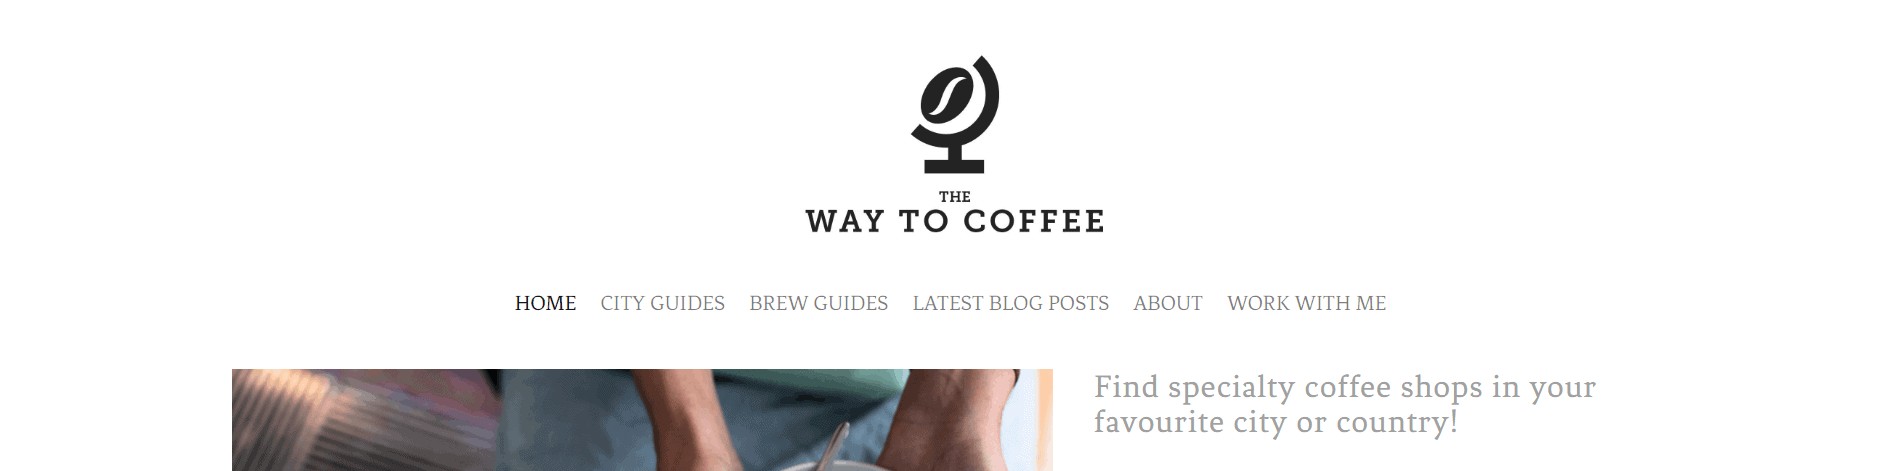 The Way to Coffee